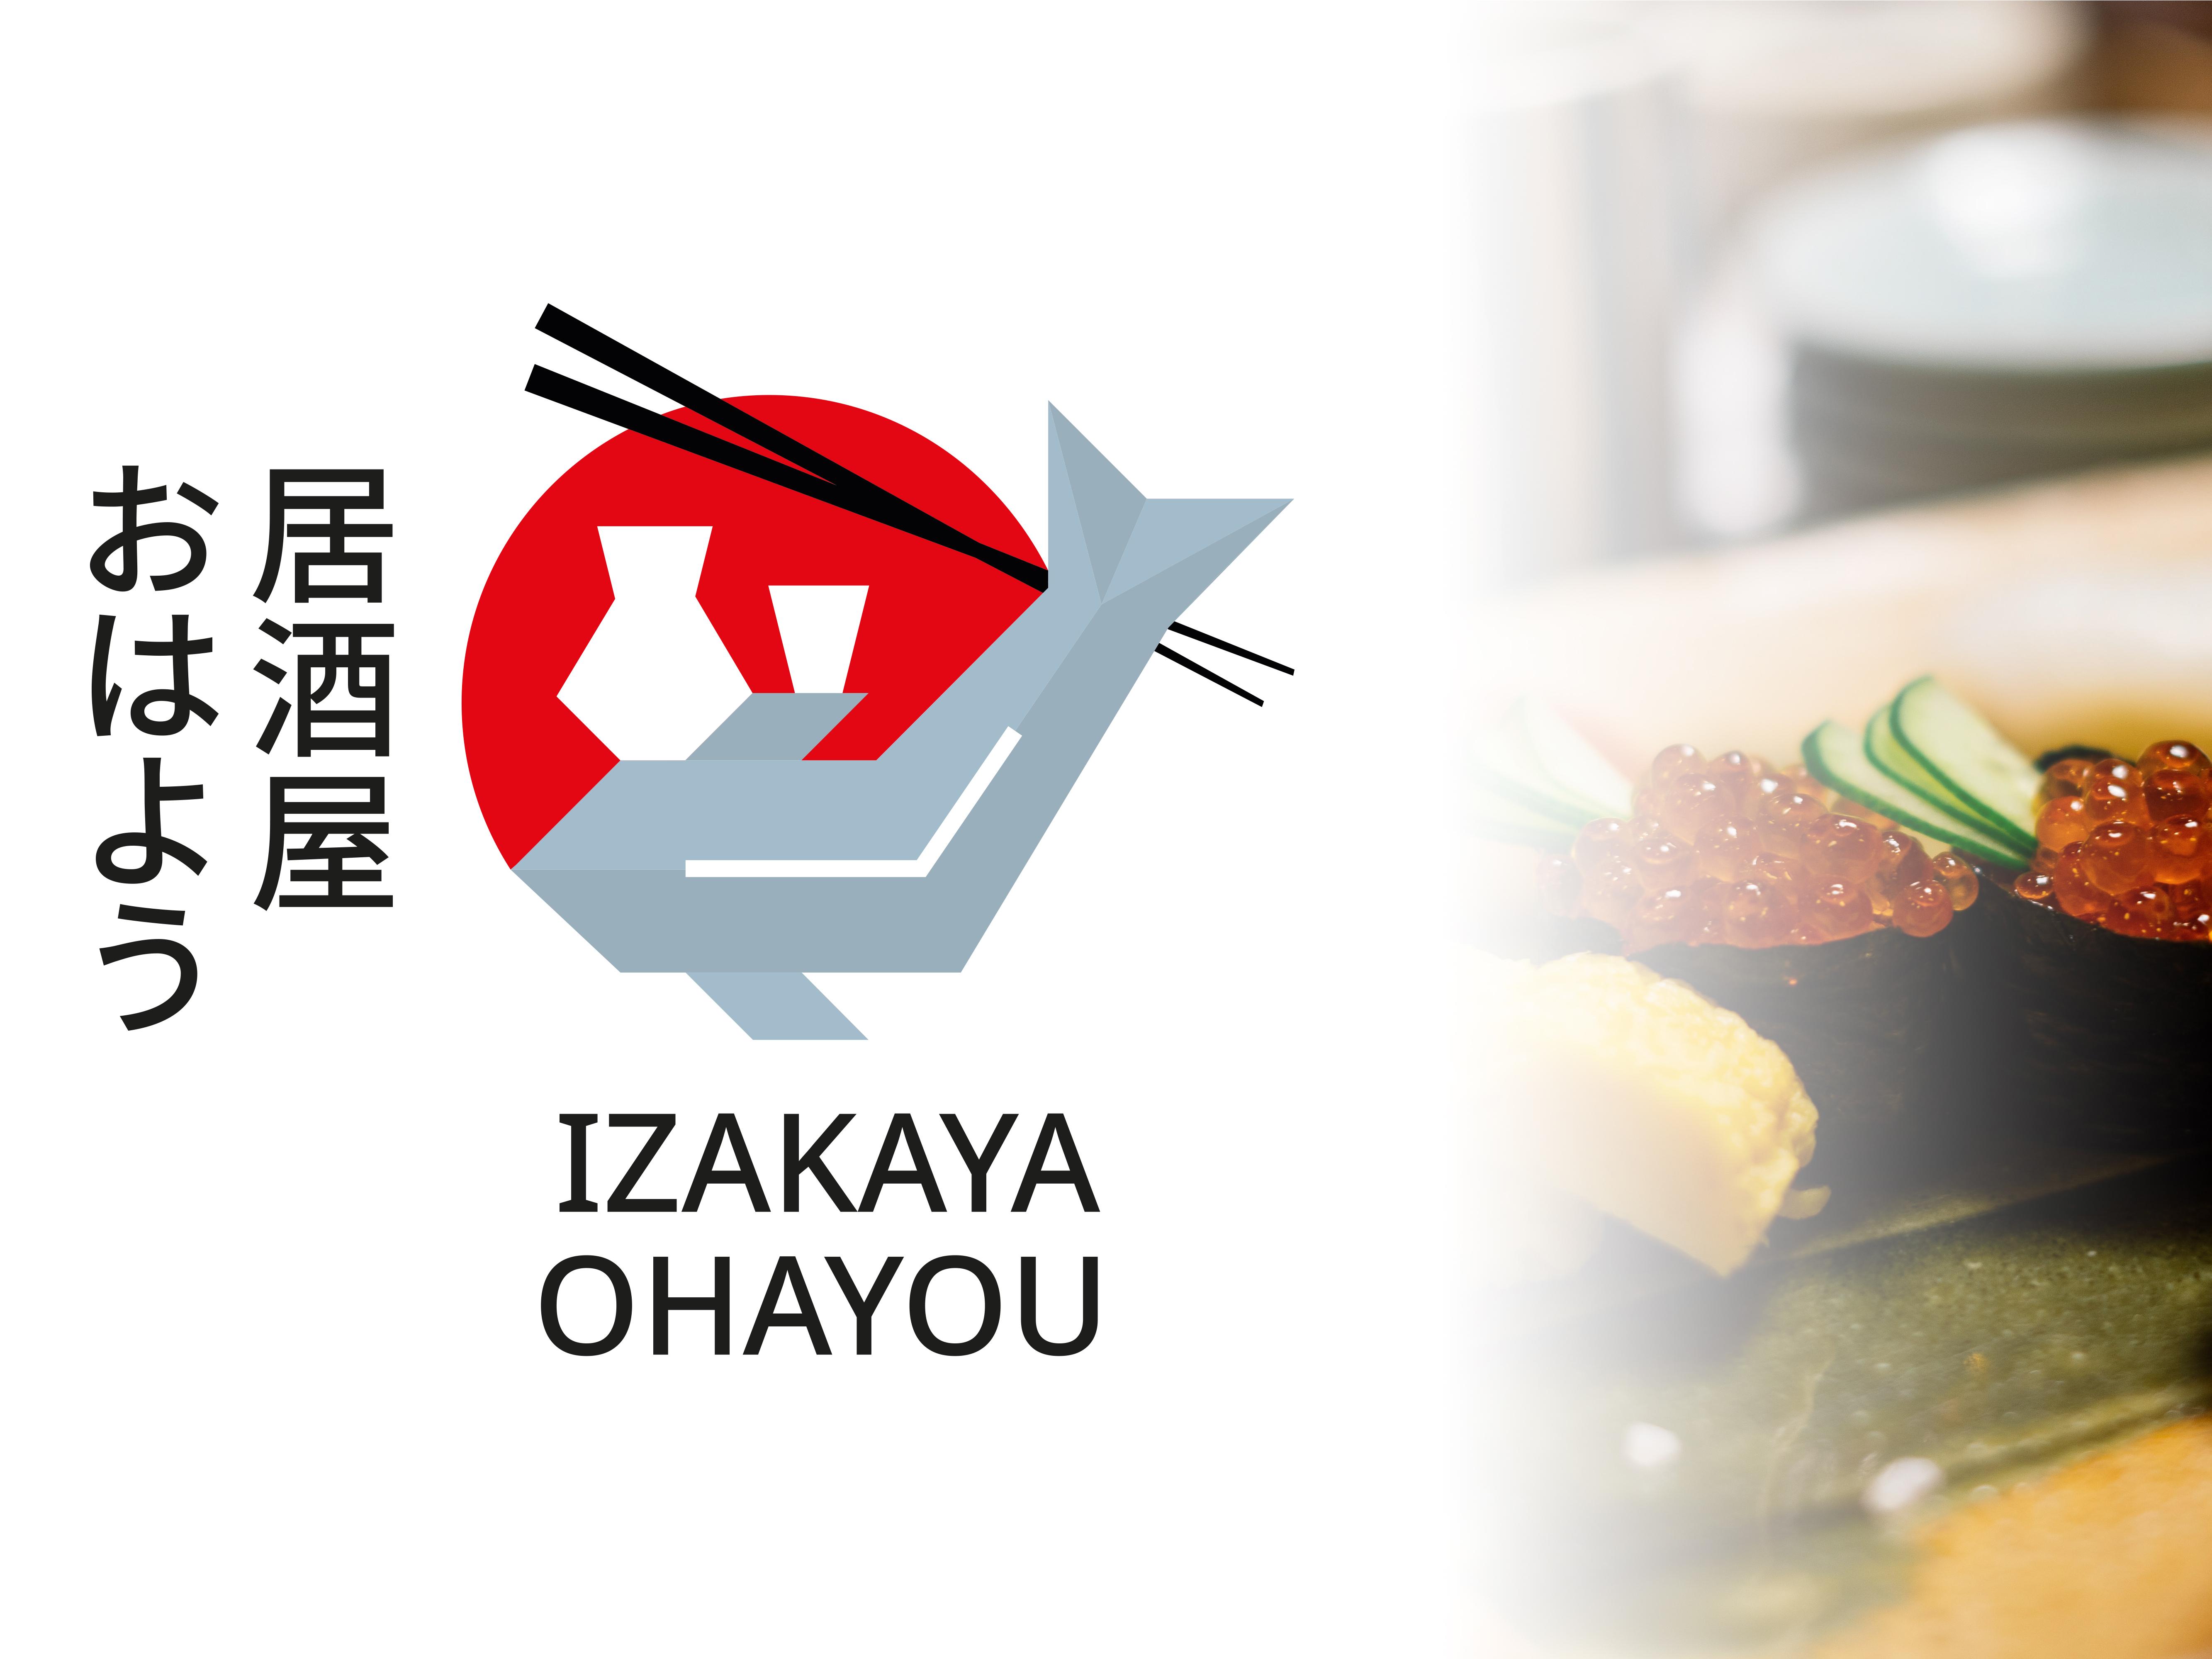 Origami - CLOSED - 137 Photos & 247 Reviews - Sushi Bars - 30 N ... | 4000x5333